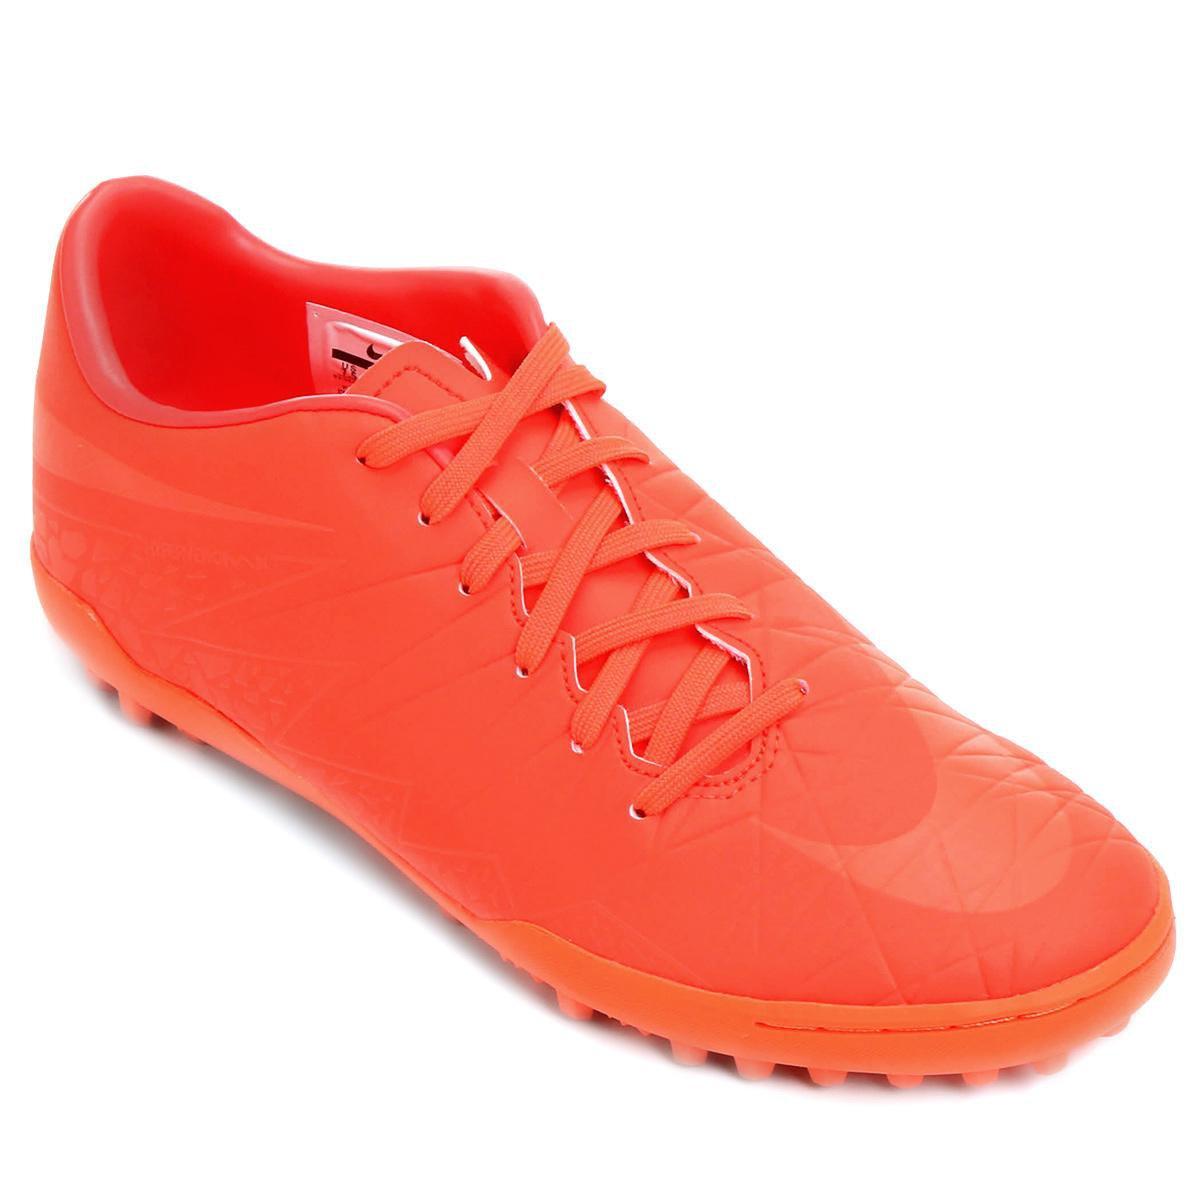 Chuteira Society Nike Hypervenom Phelon 2 TF Masculina - Compre Agora  eaa8babd41e22